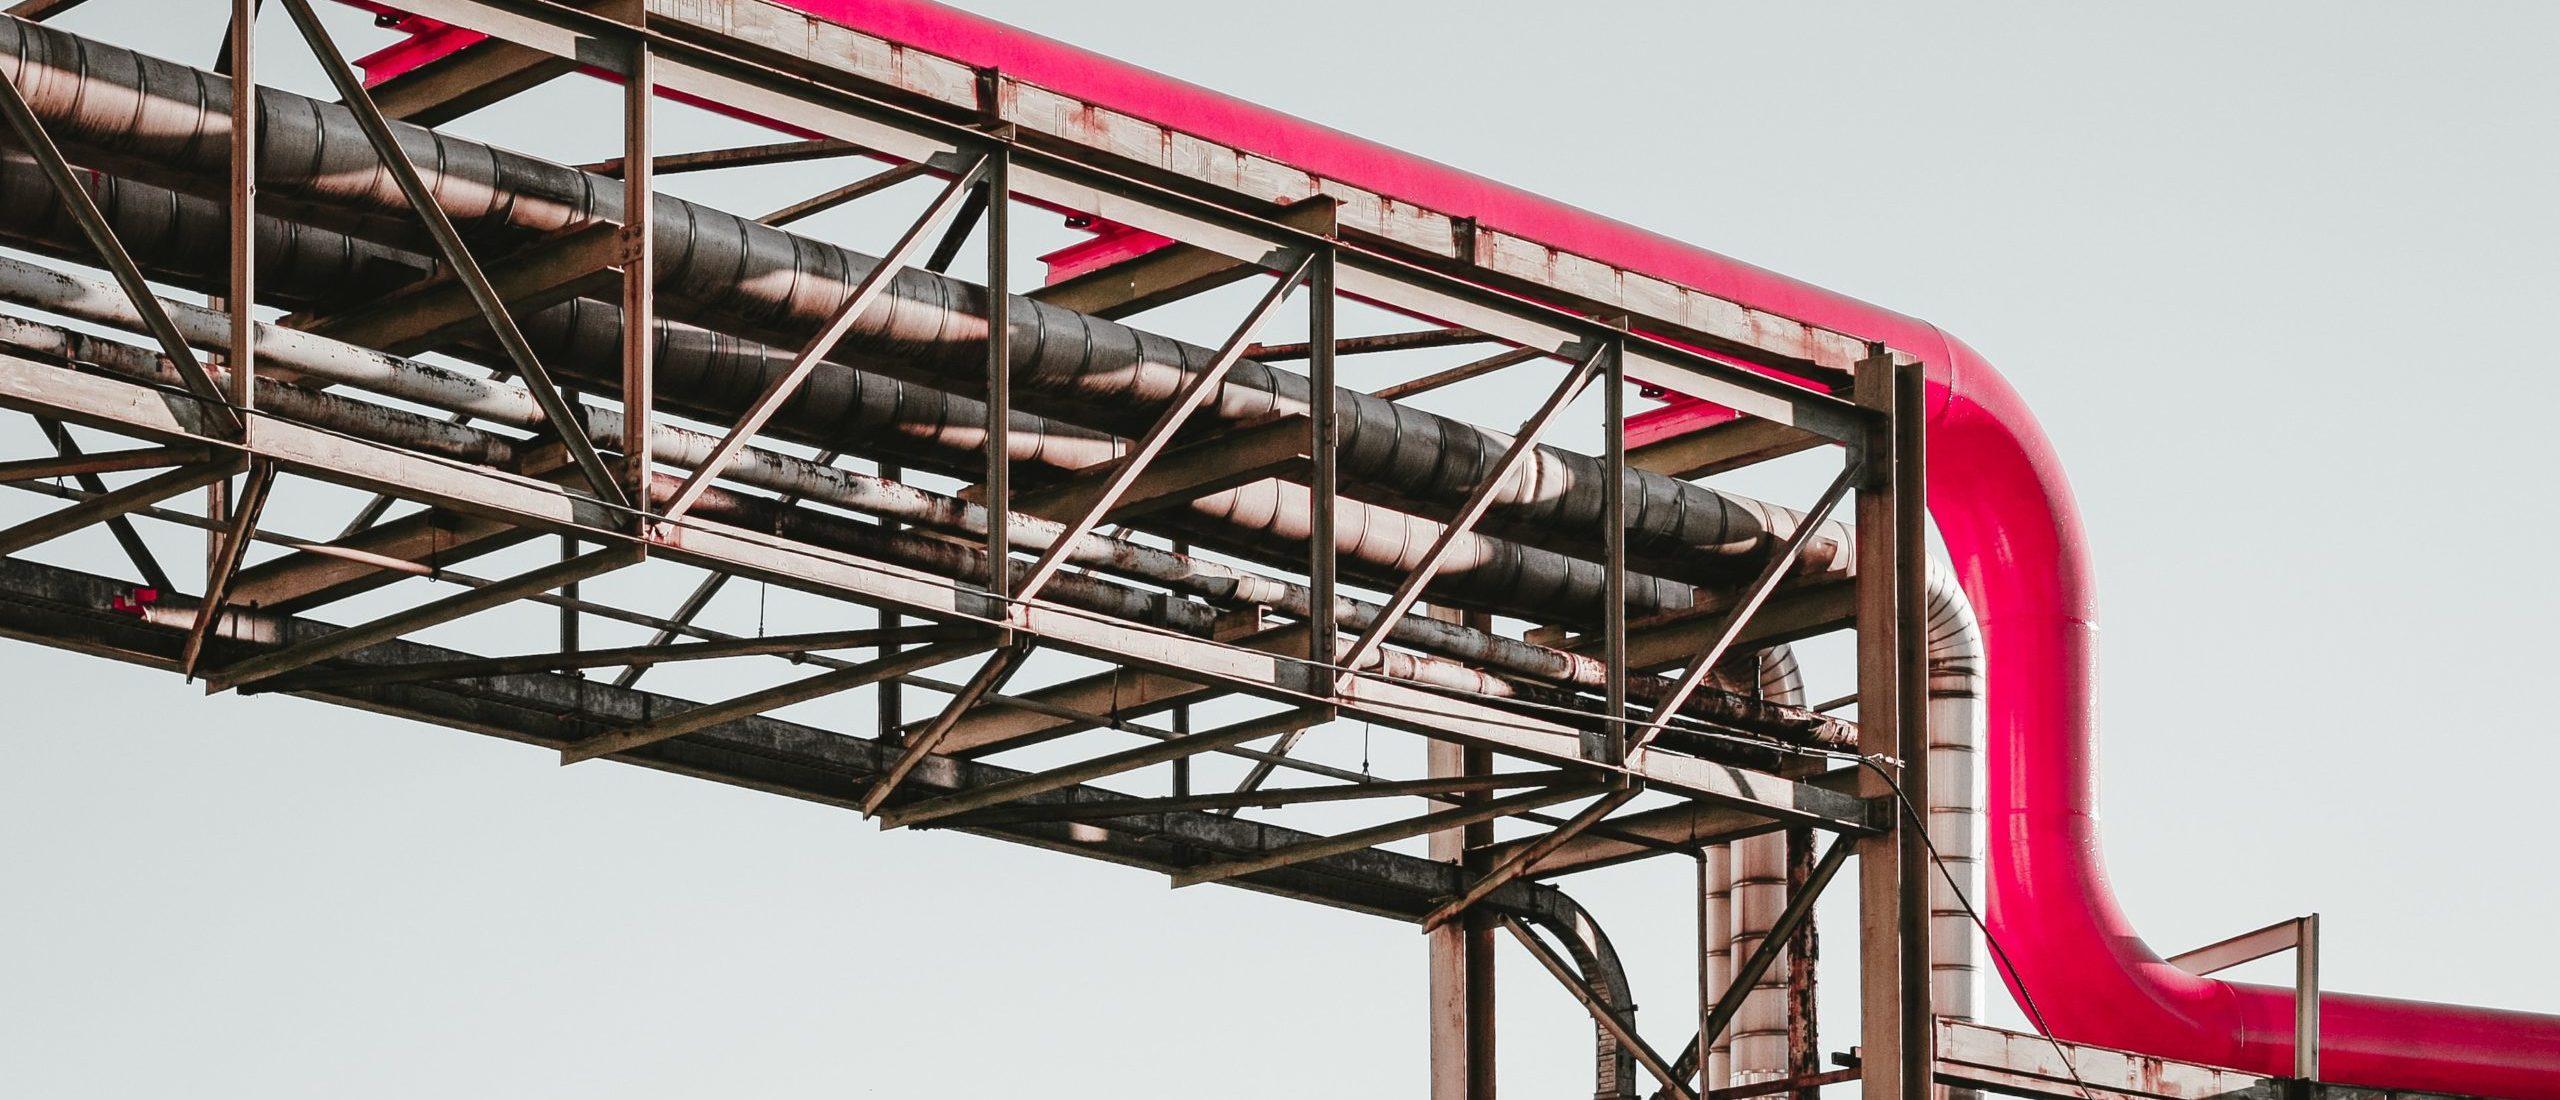 Estructura con tubería